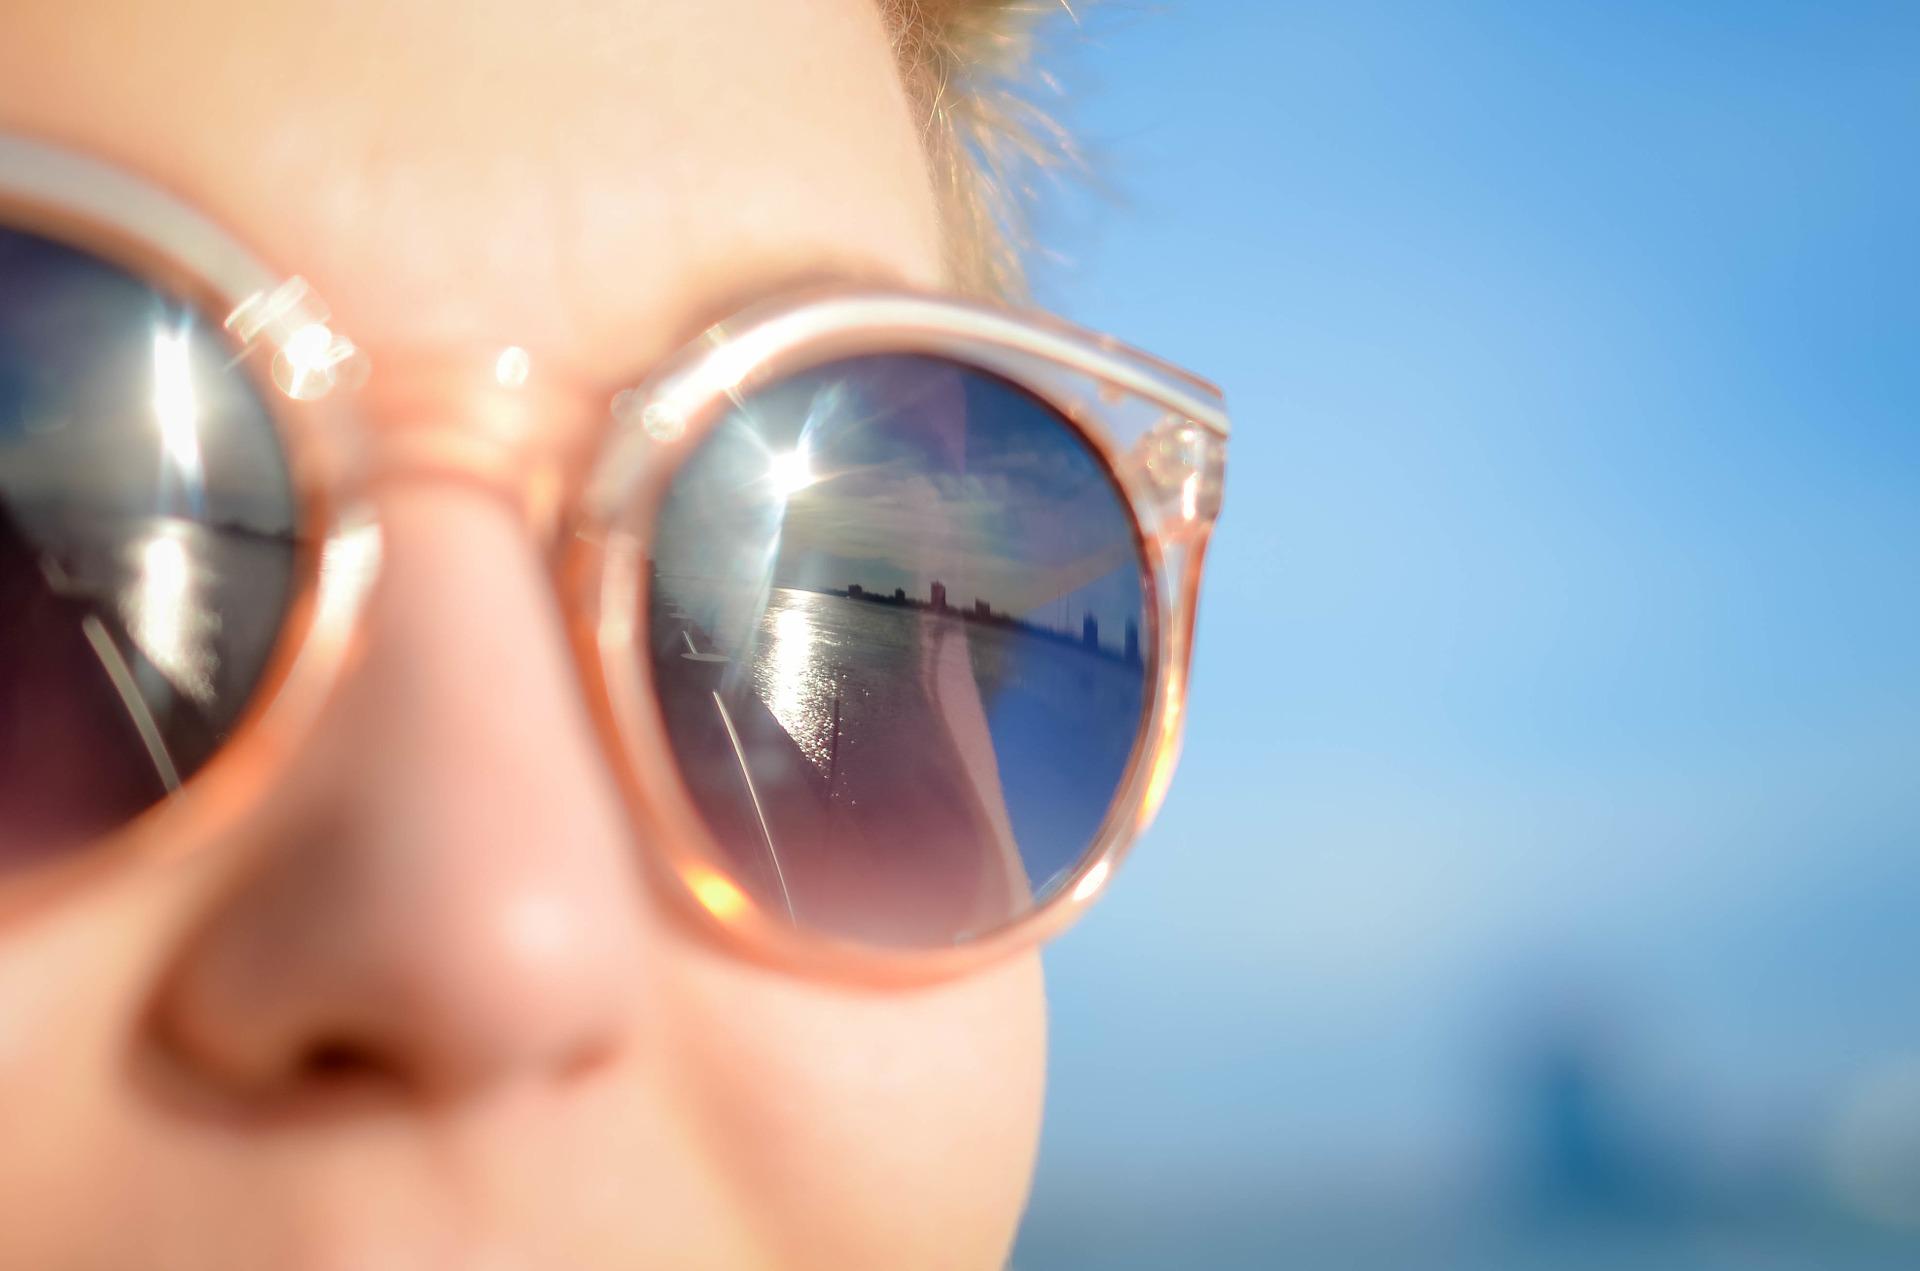 sunglasses-1209619_1920